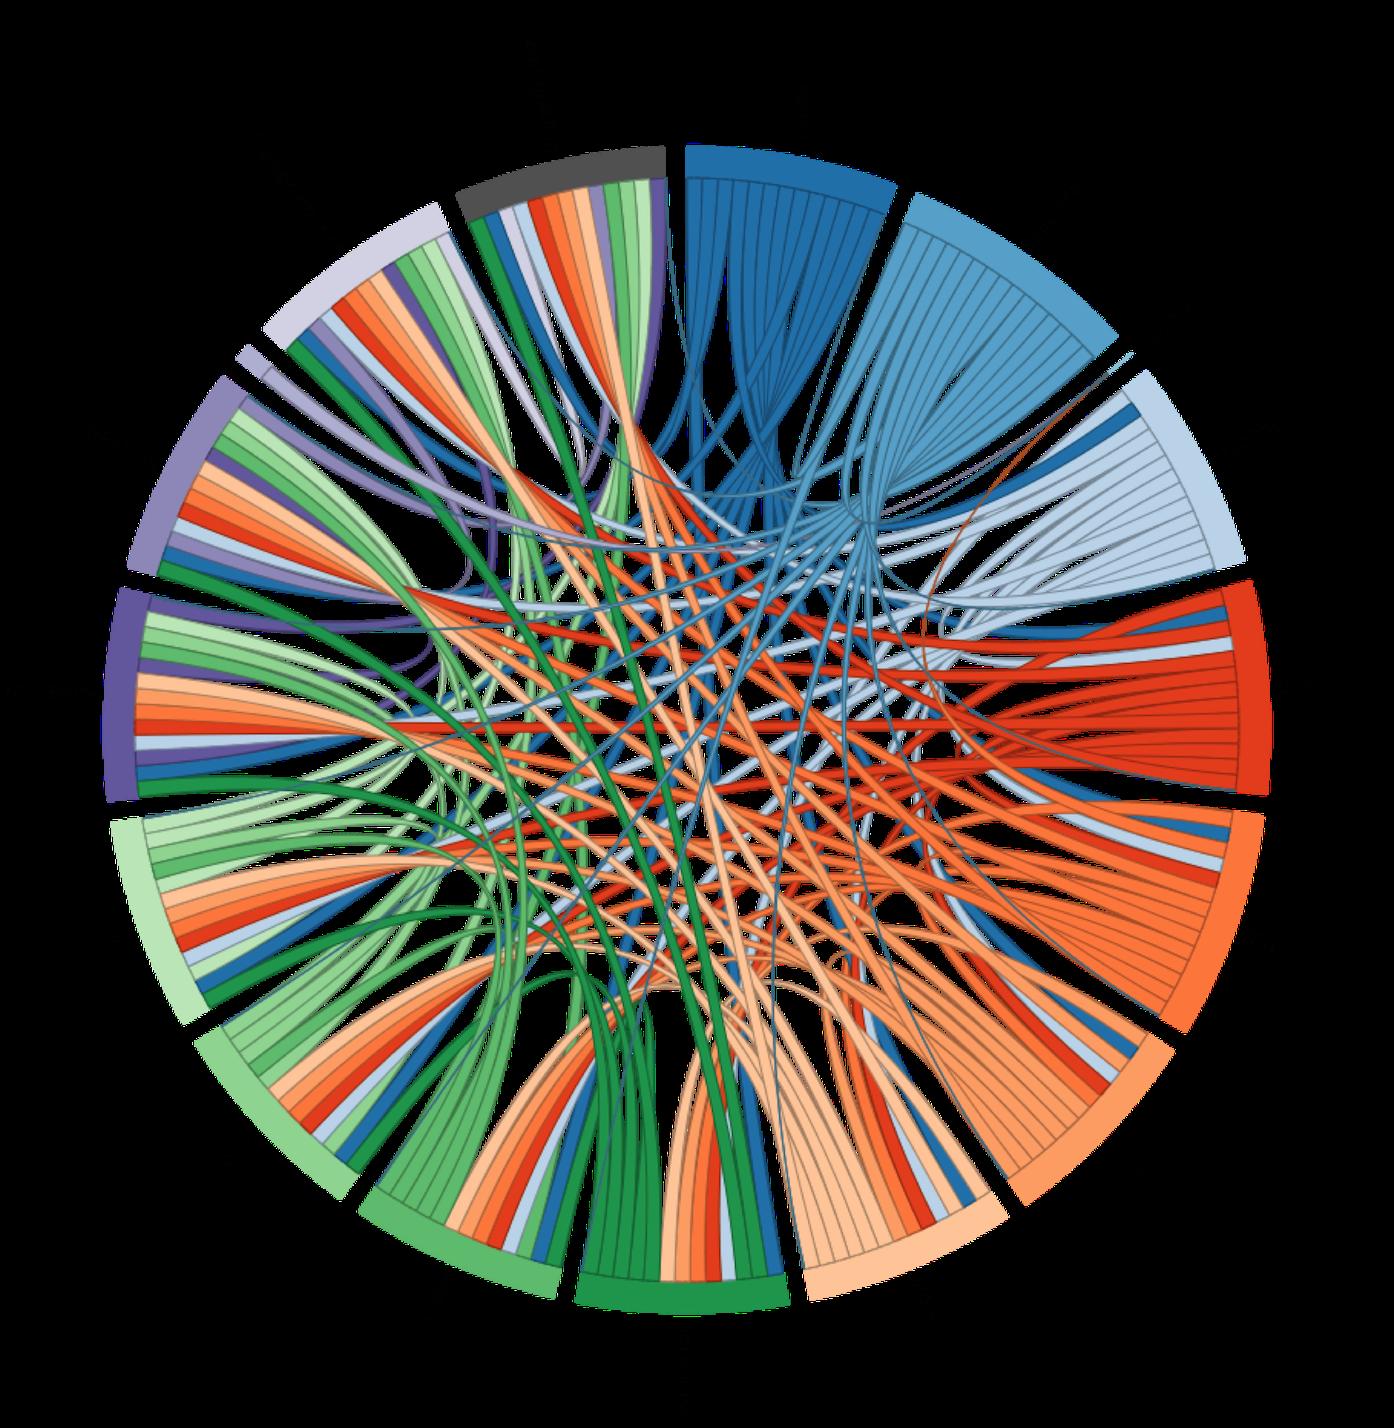 University bundle, data visulation